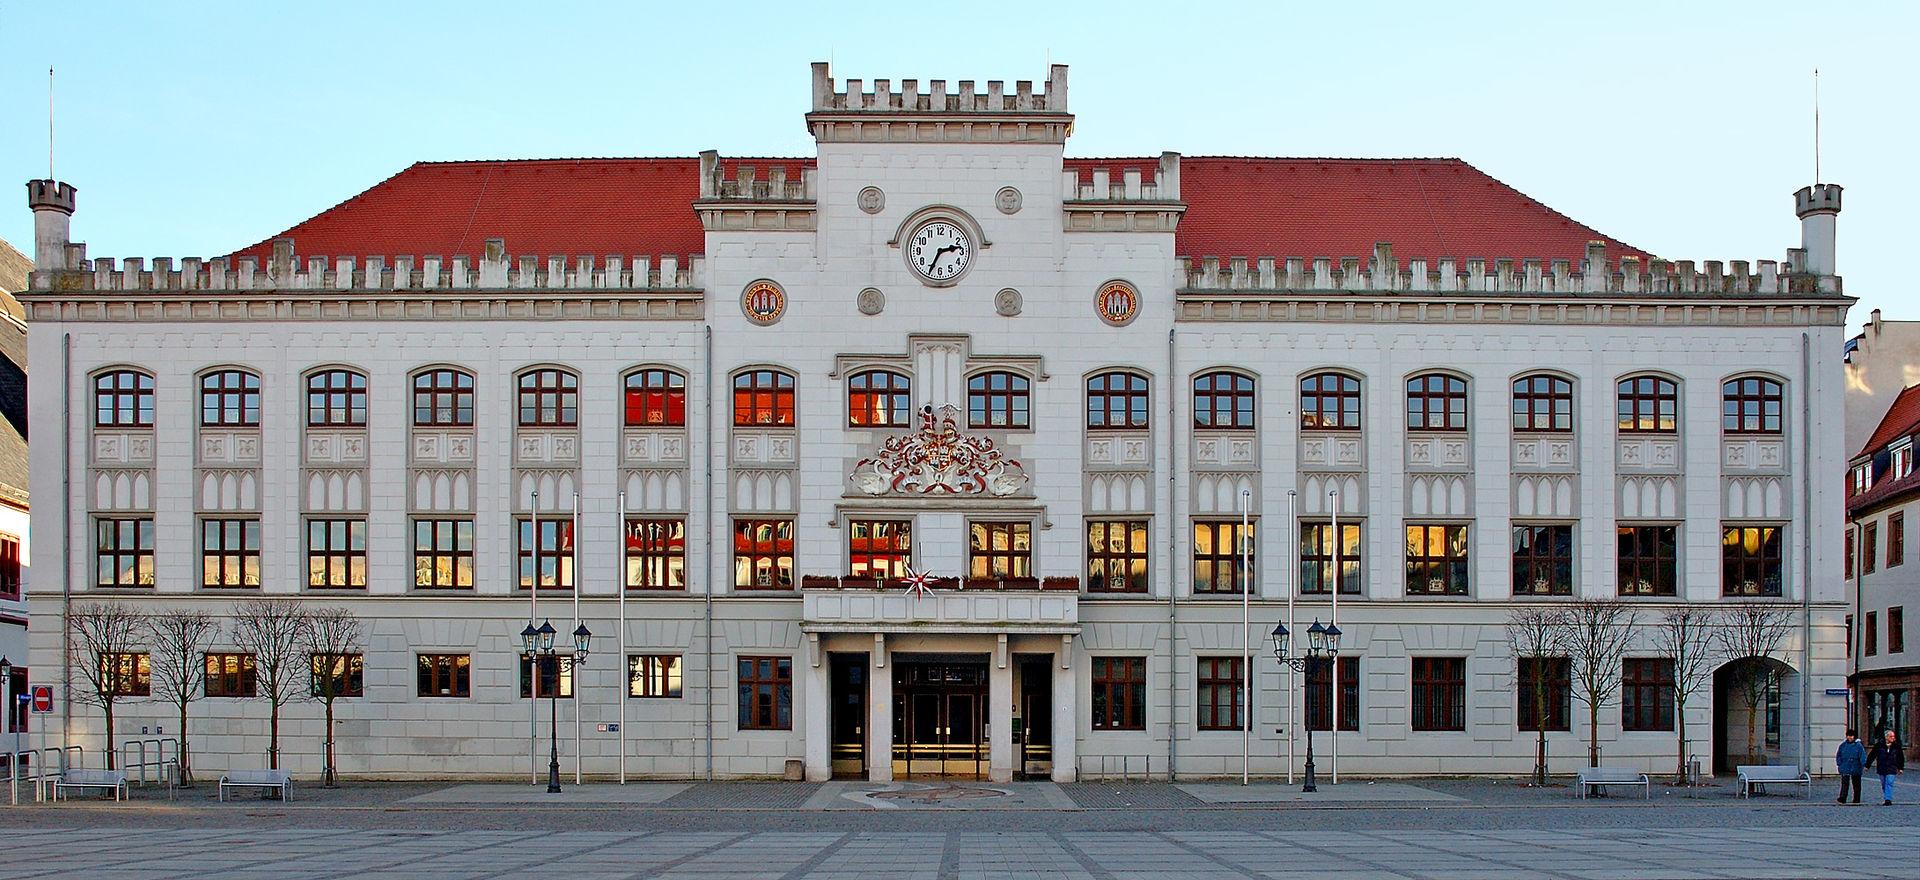 Zwickau - Stadt & Technikgeschichte am 21.10.2020